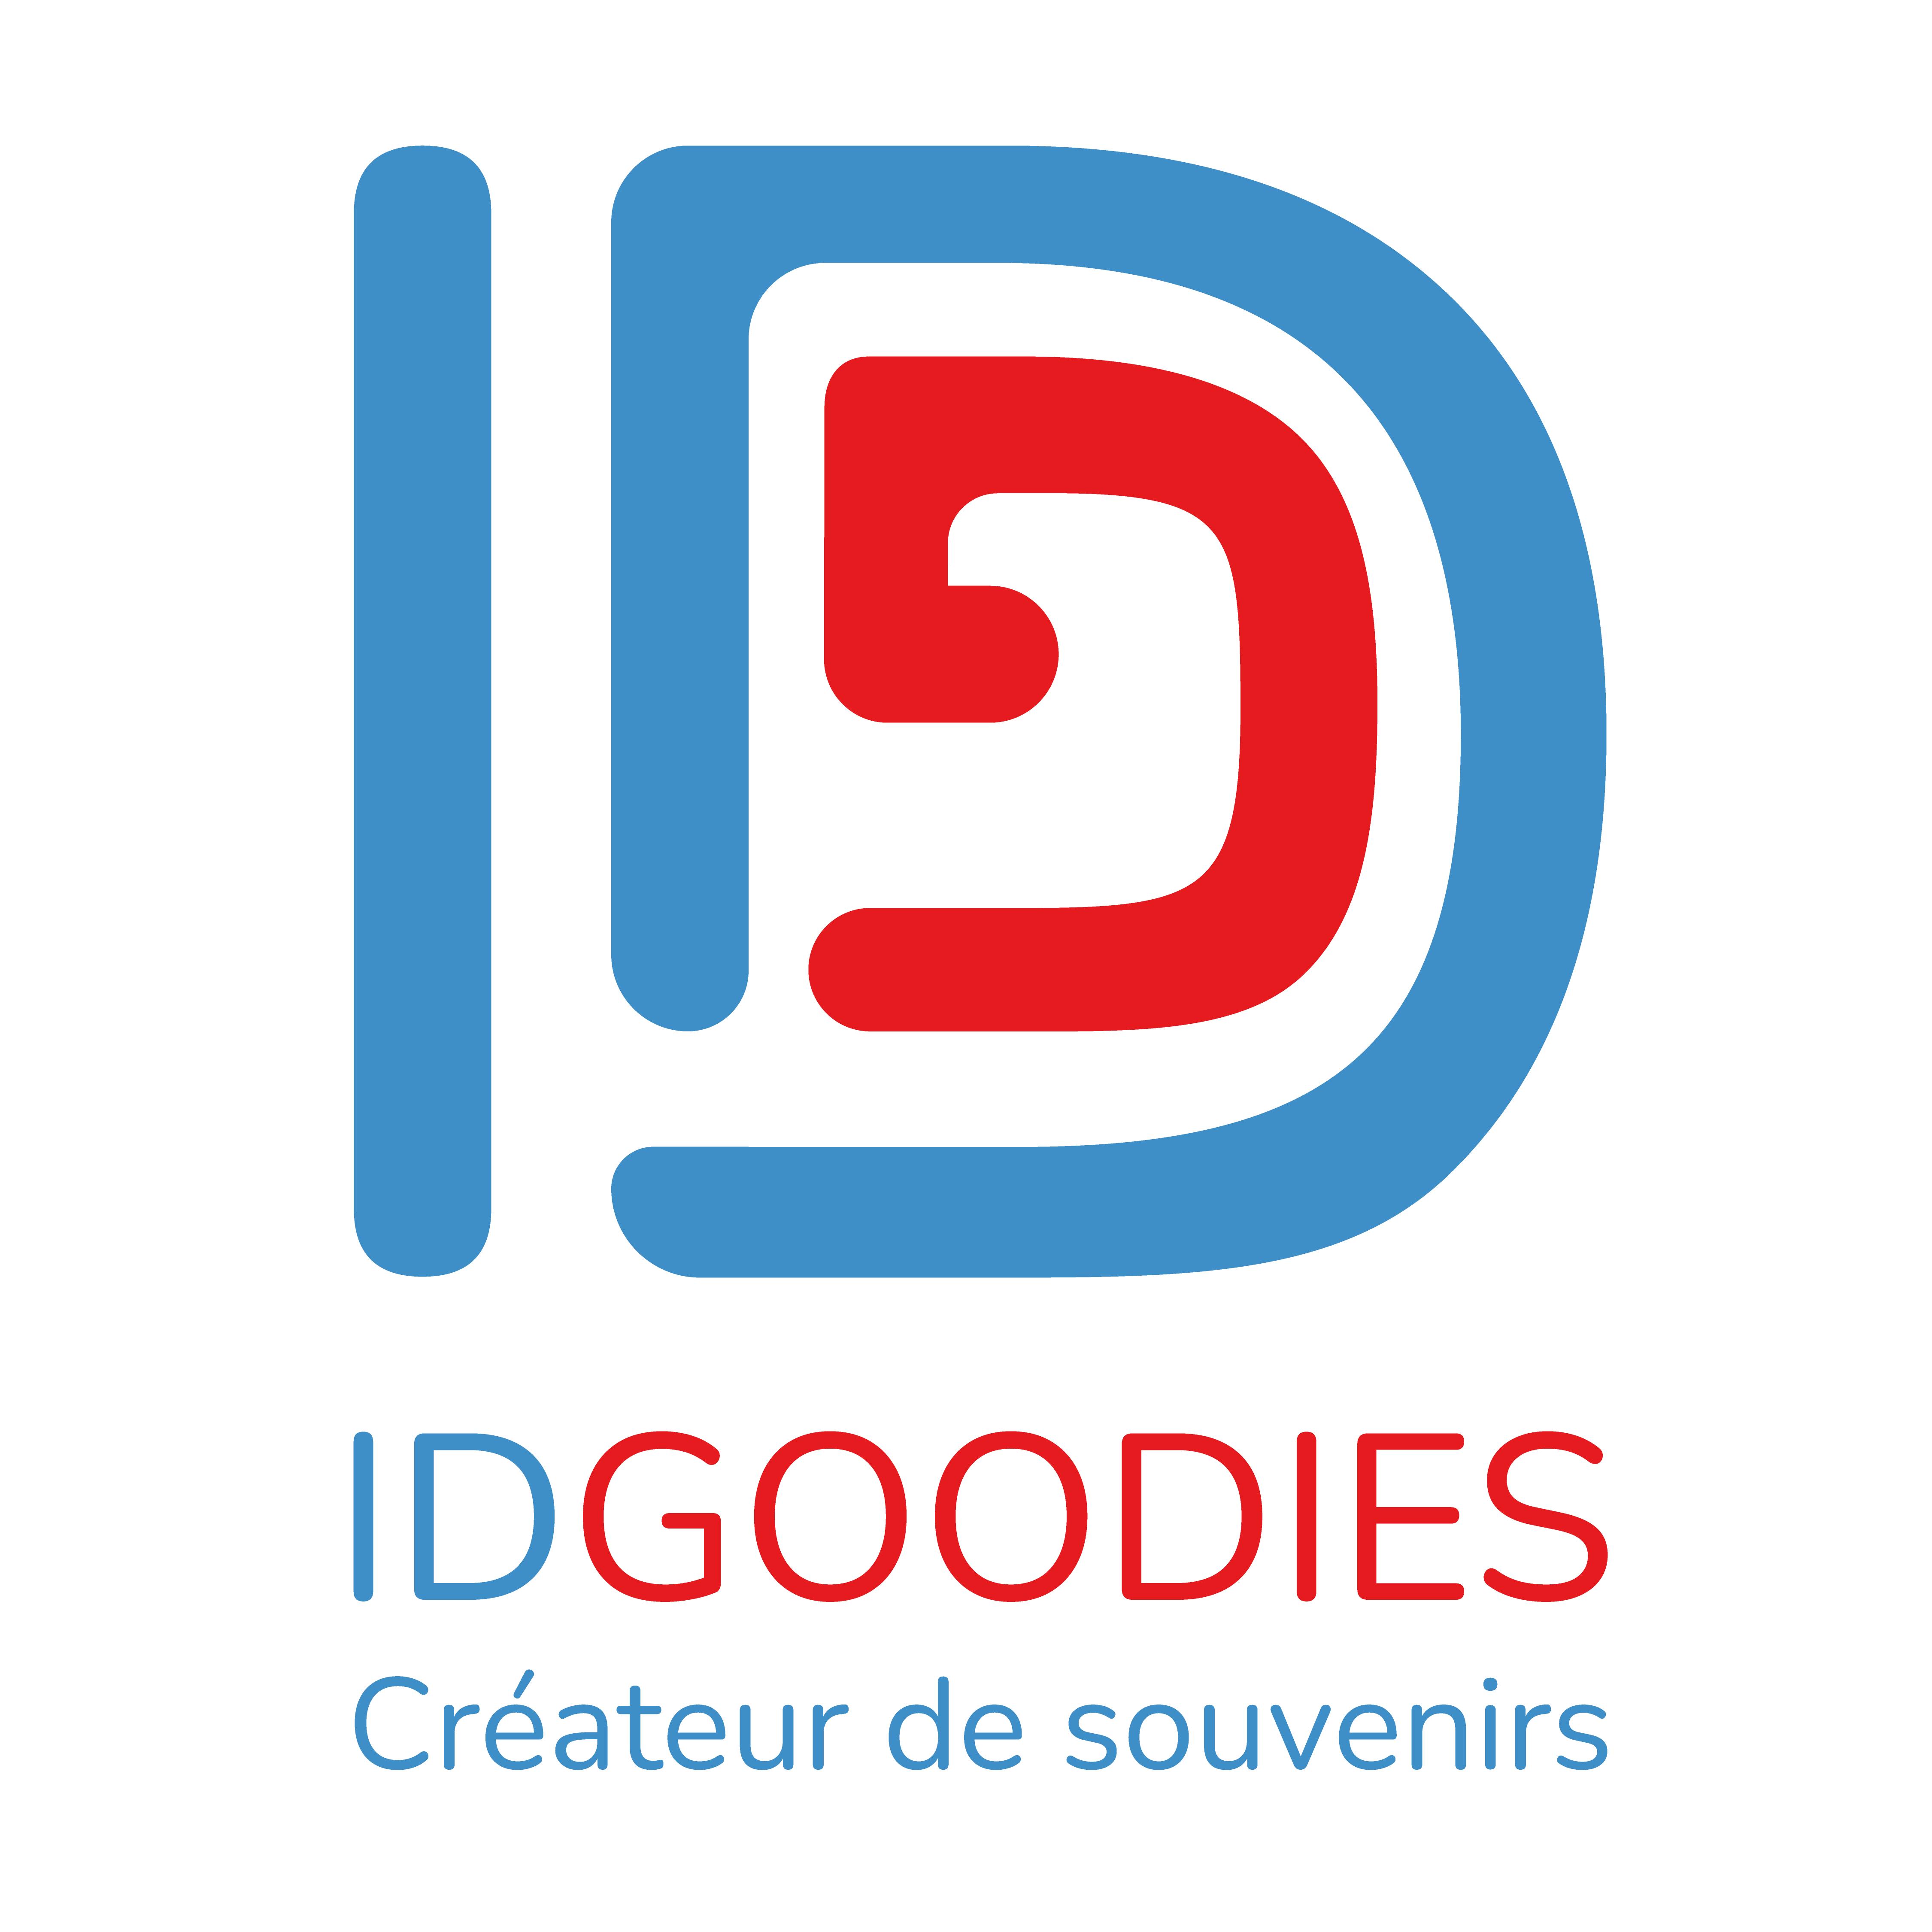 IDGoodies